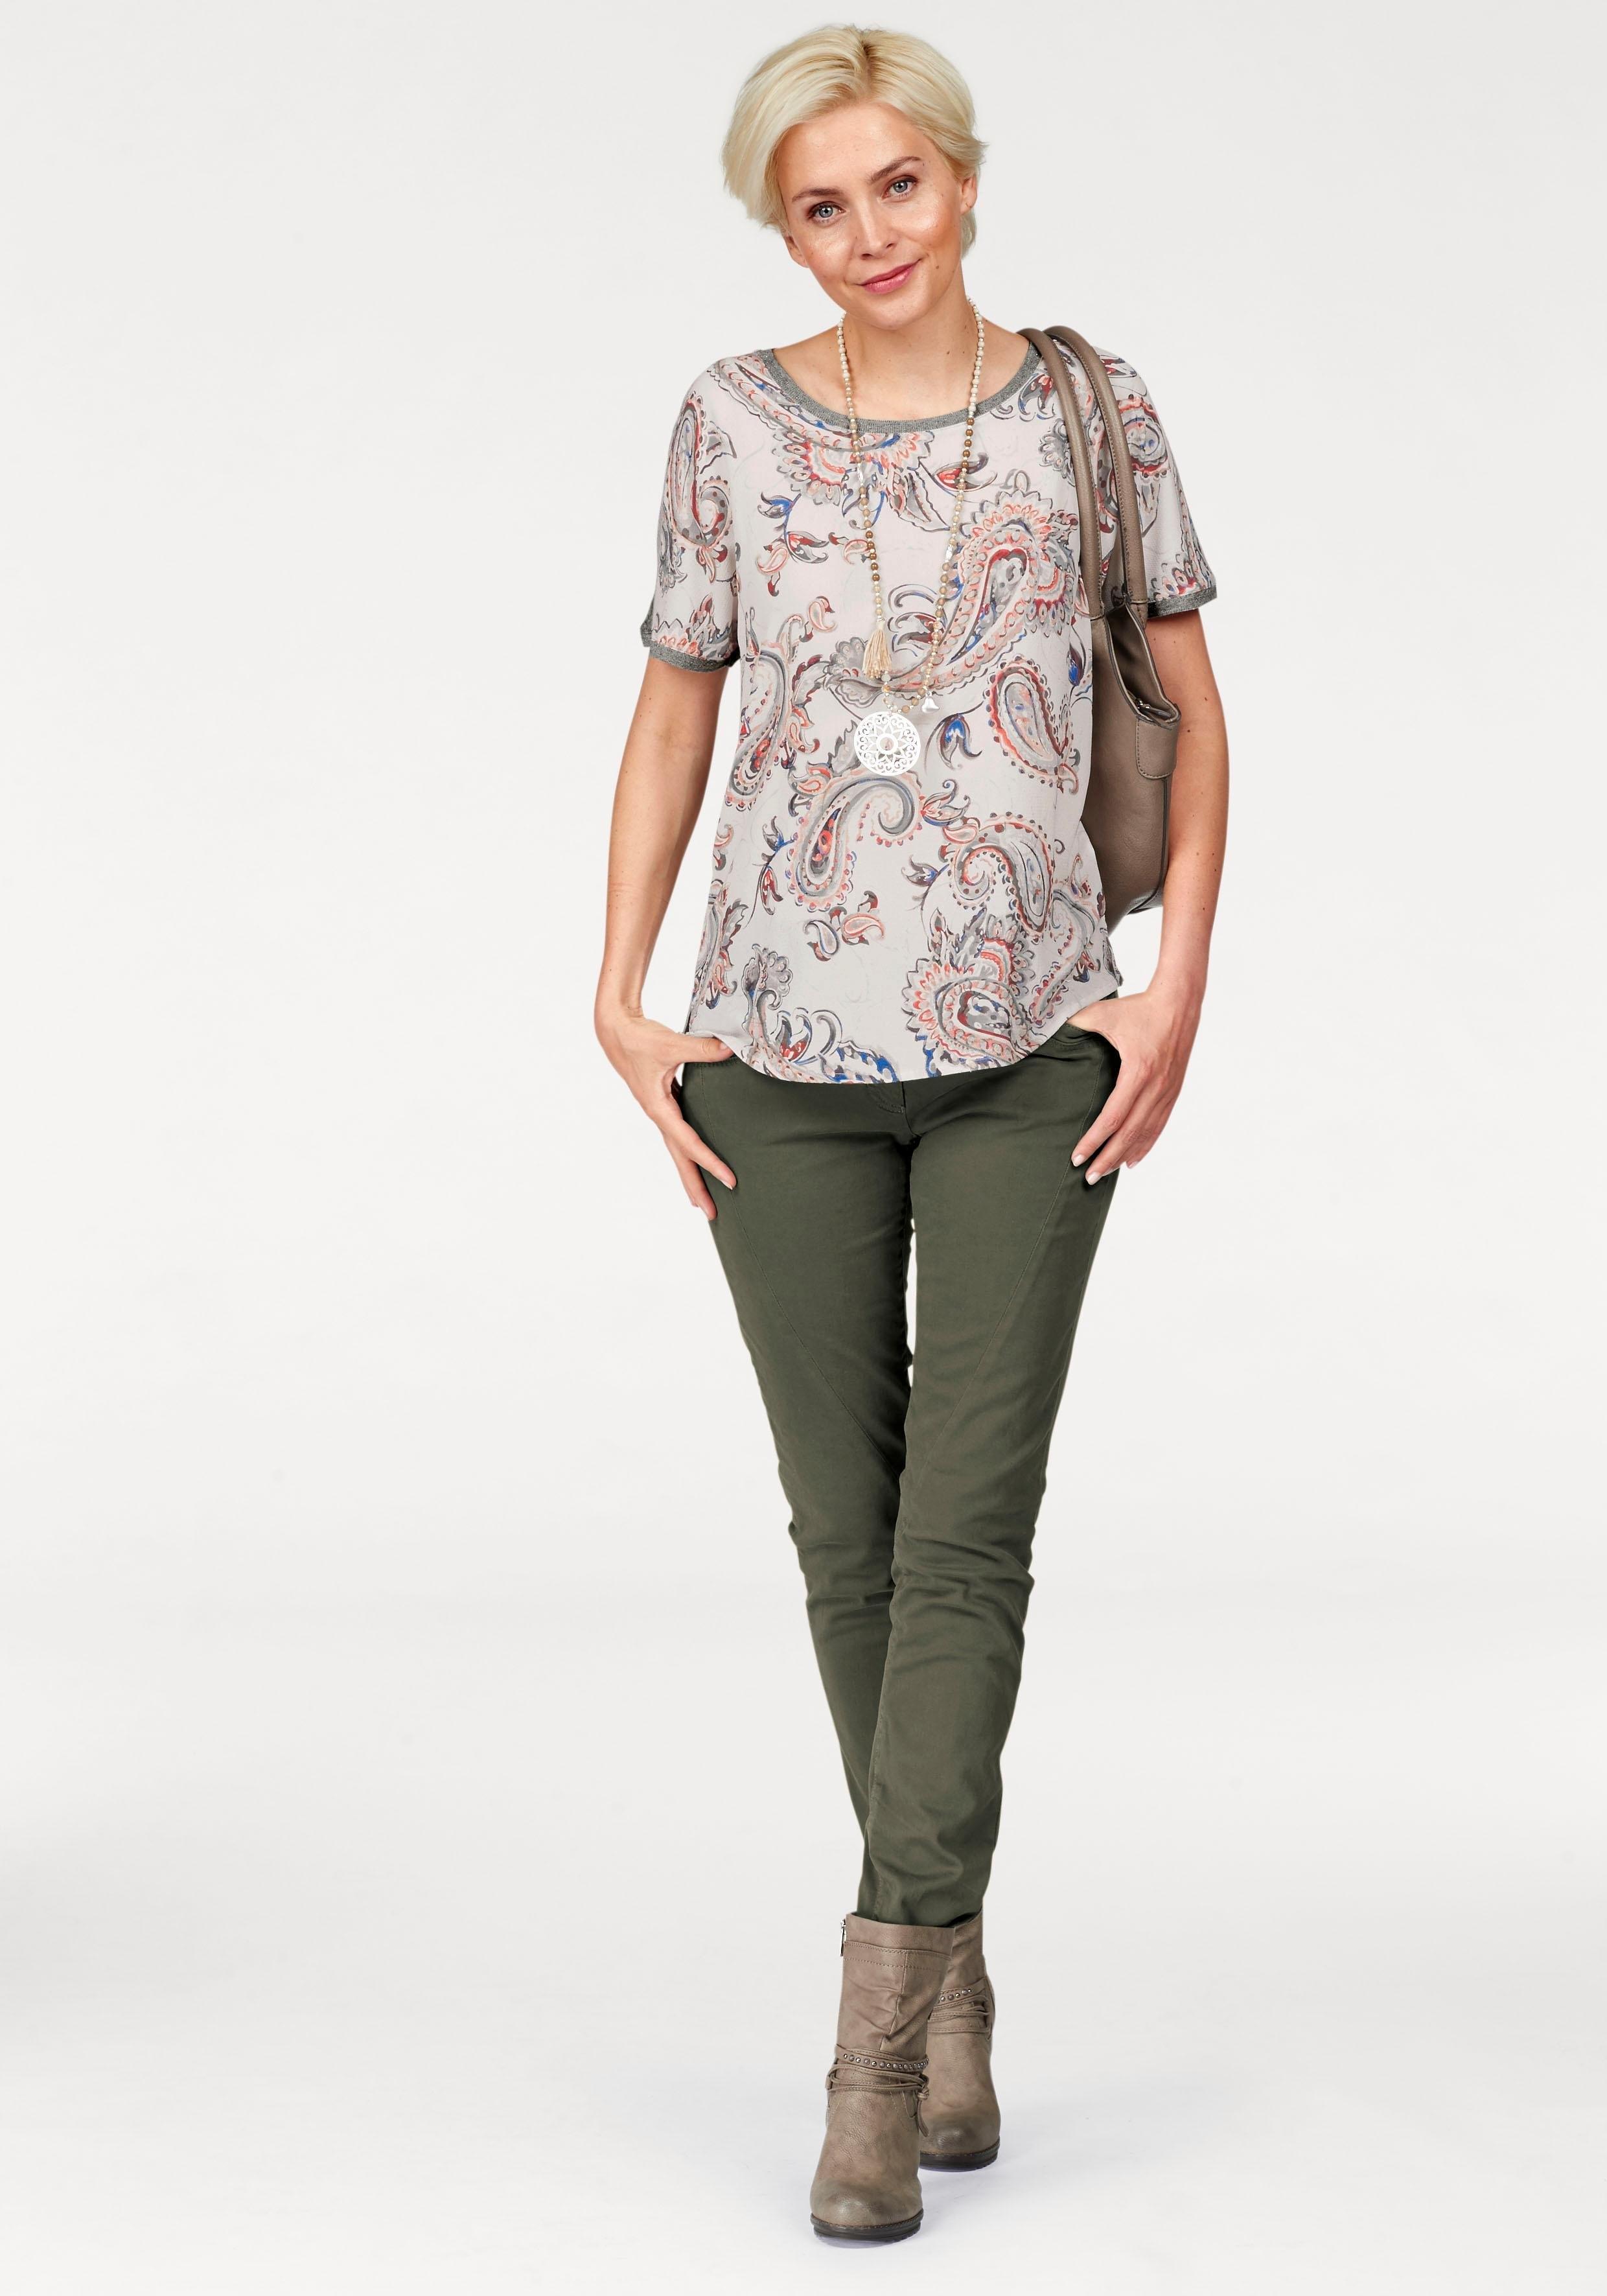 Brax Winkel Shirt De Online In gb7yIYf6v